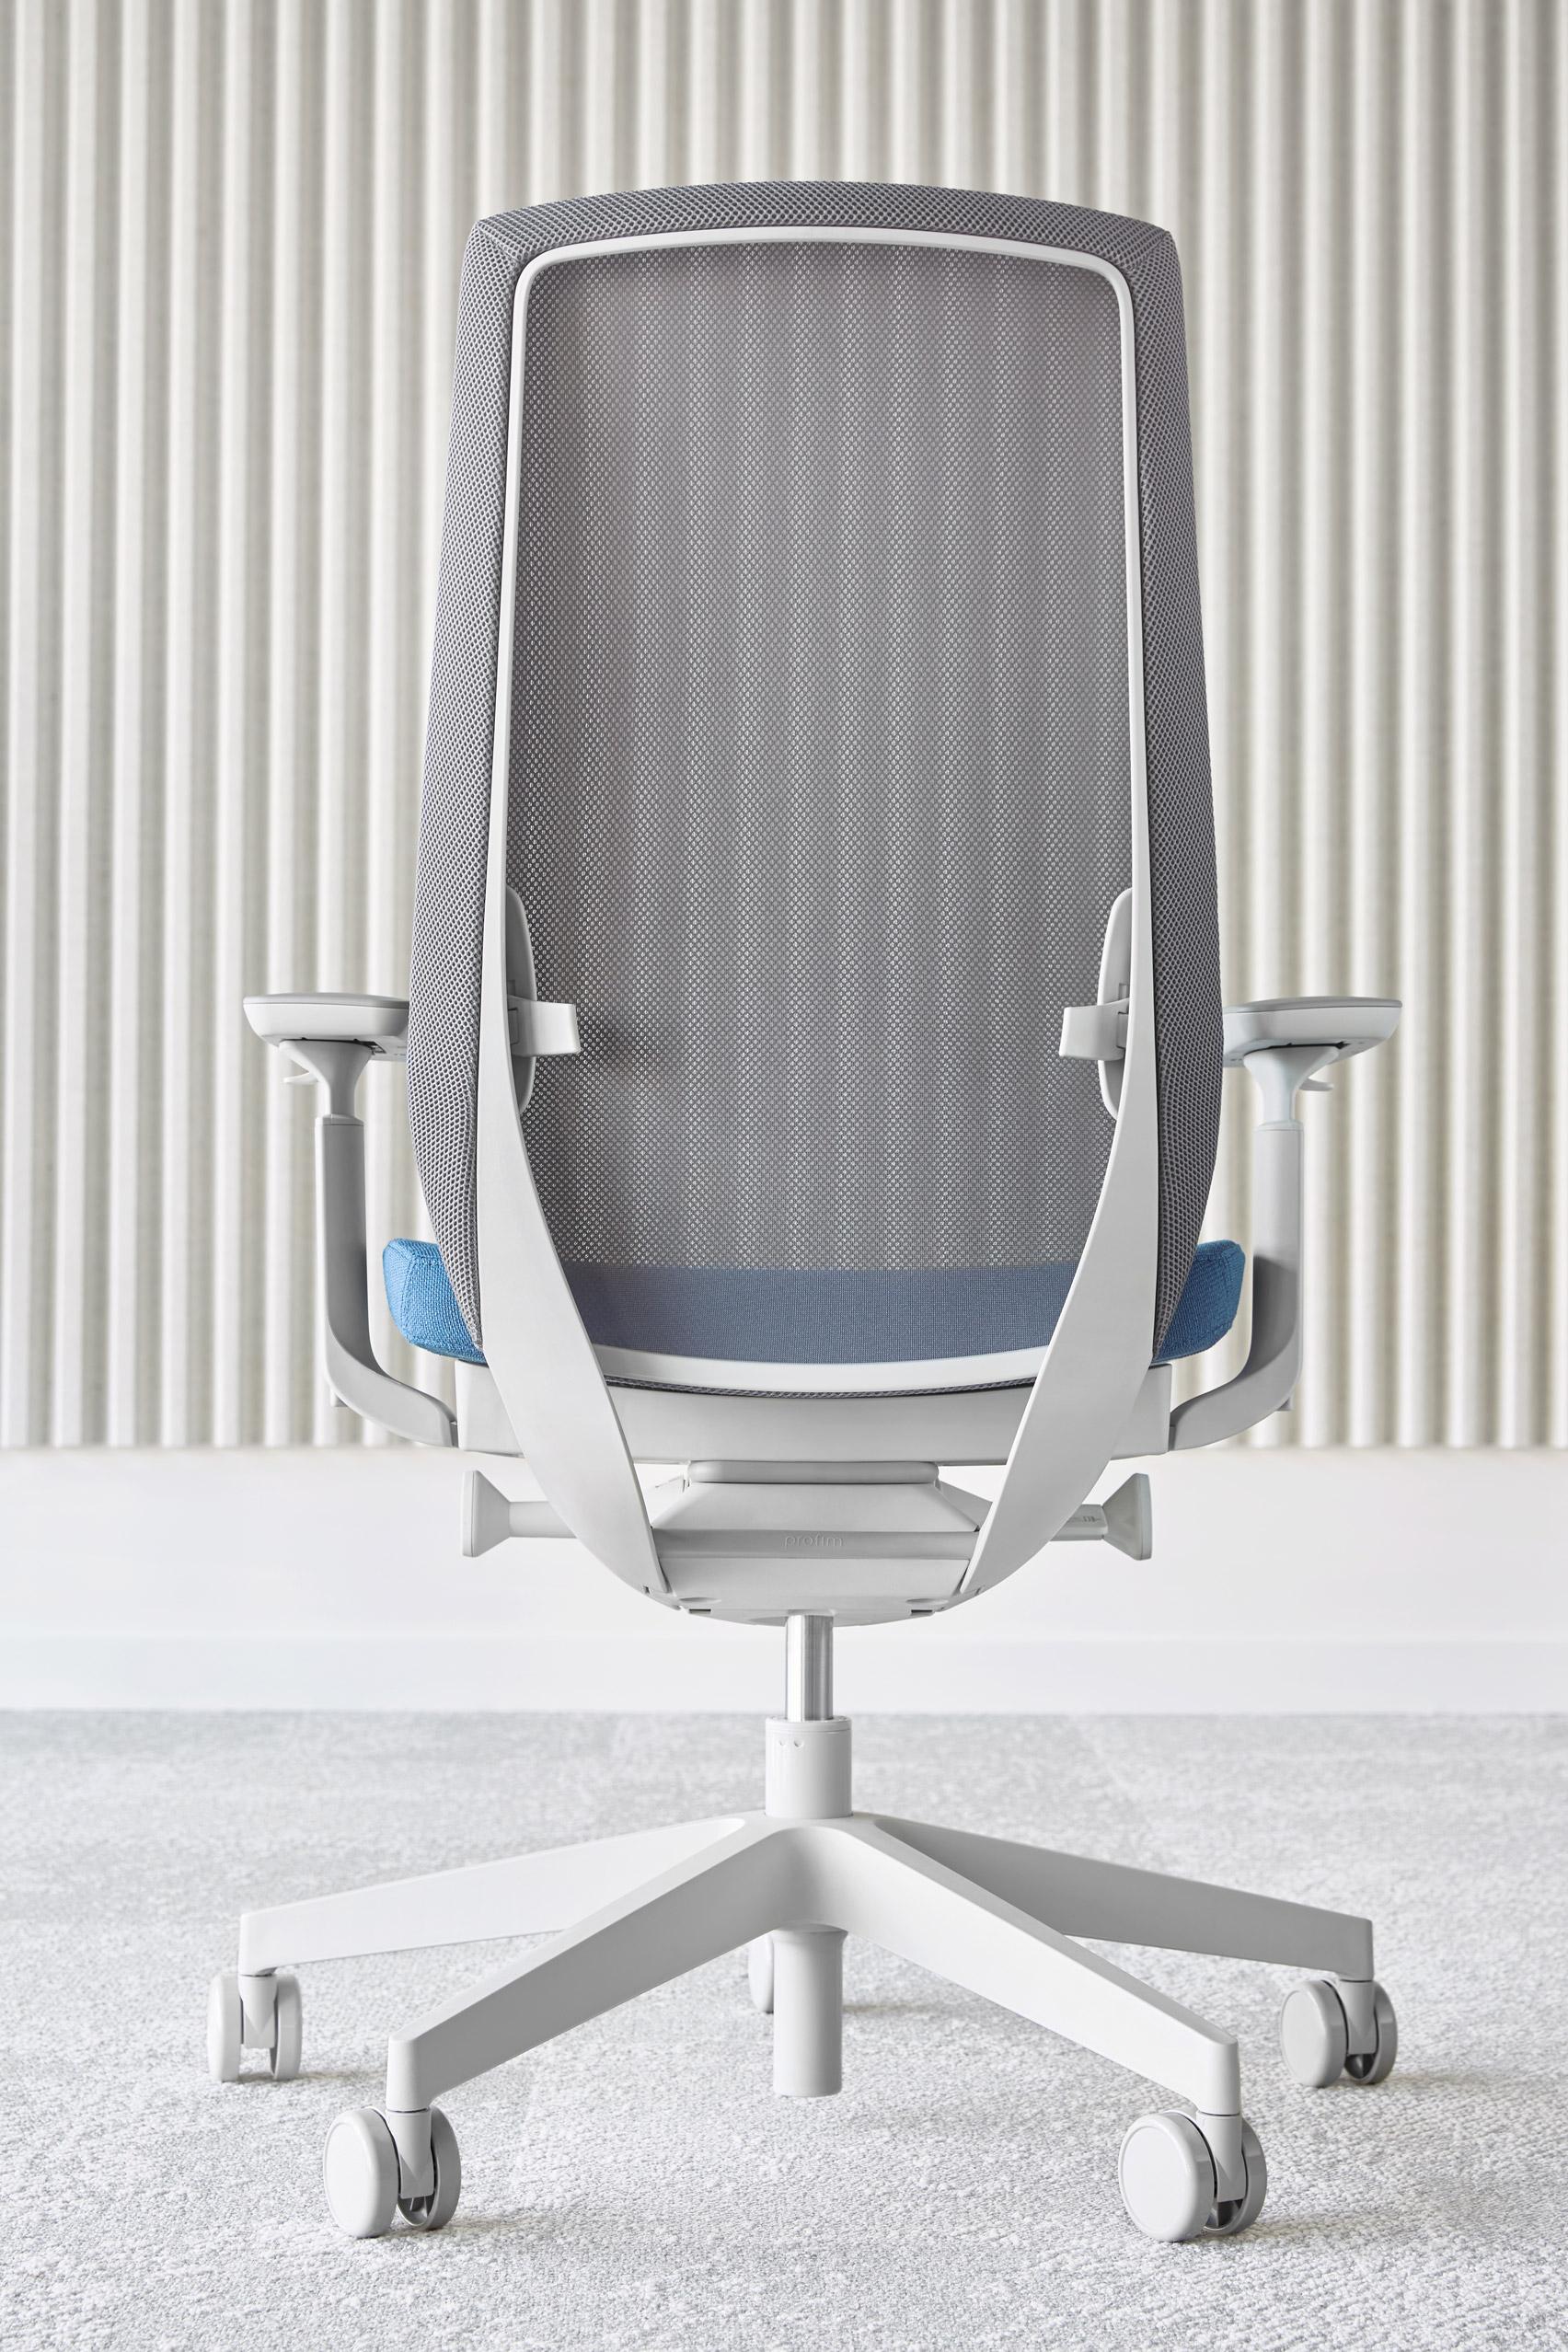 An ergonomic office chair with a mesh backrest